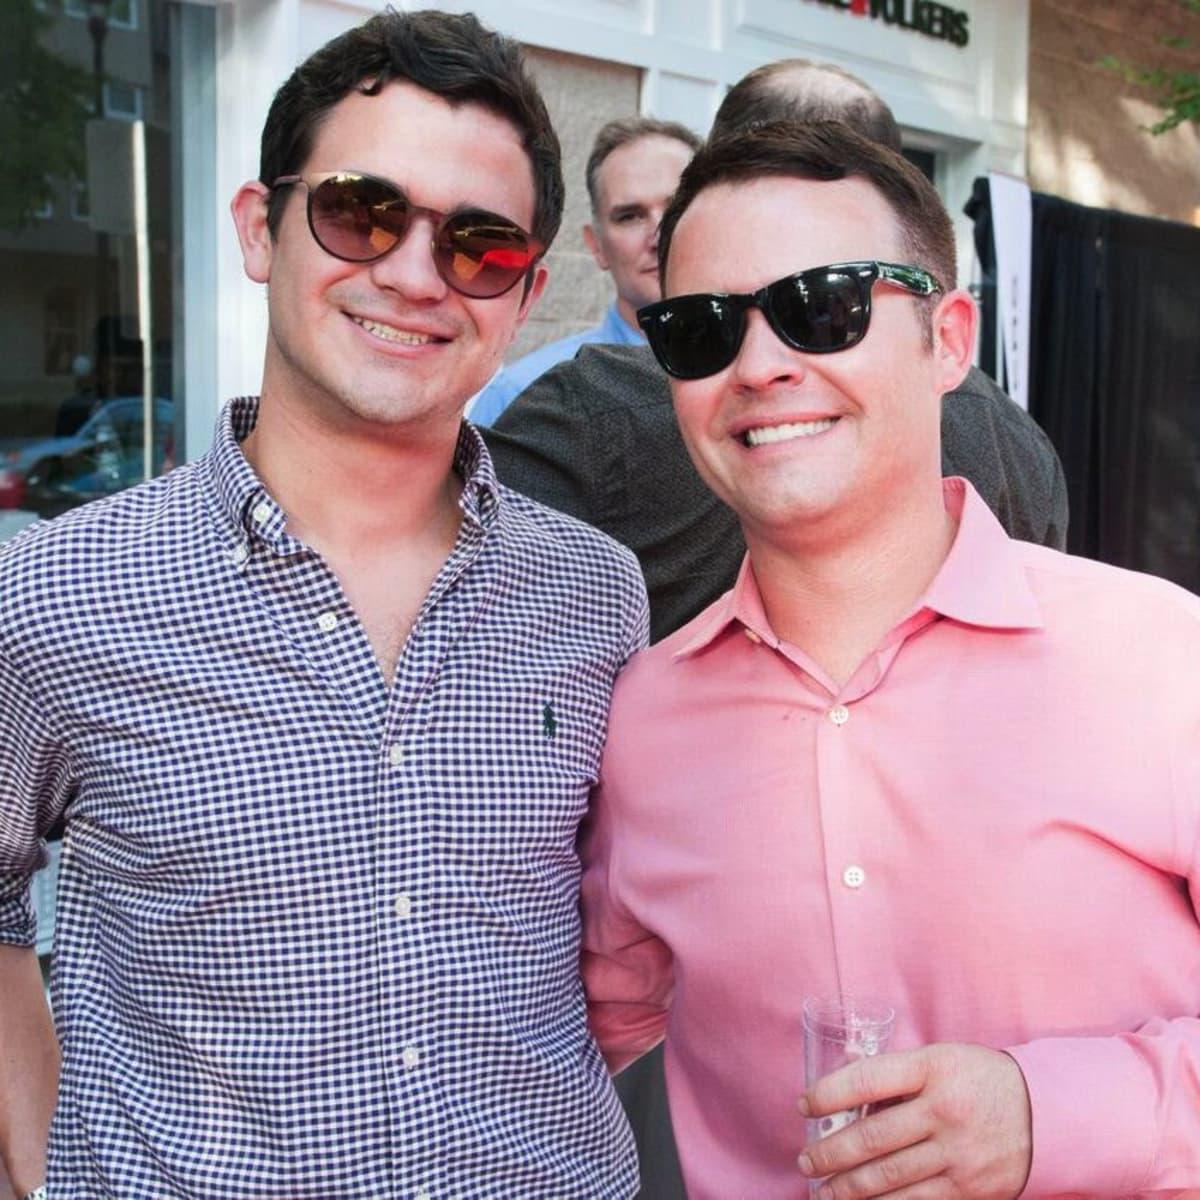 Houston, Engel and Völkers Launch Party, June 2015, Brennan Hermier, Matthew Curtis